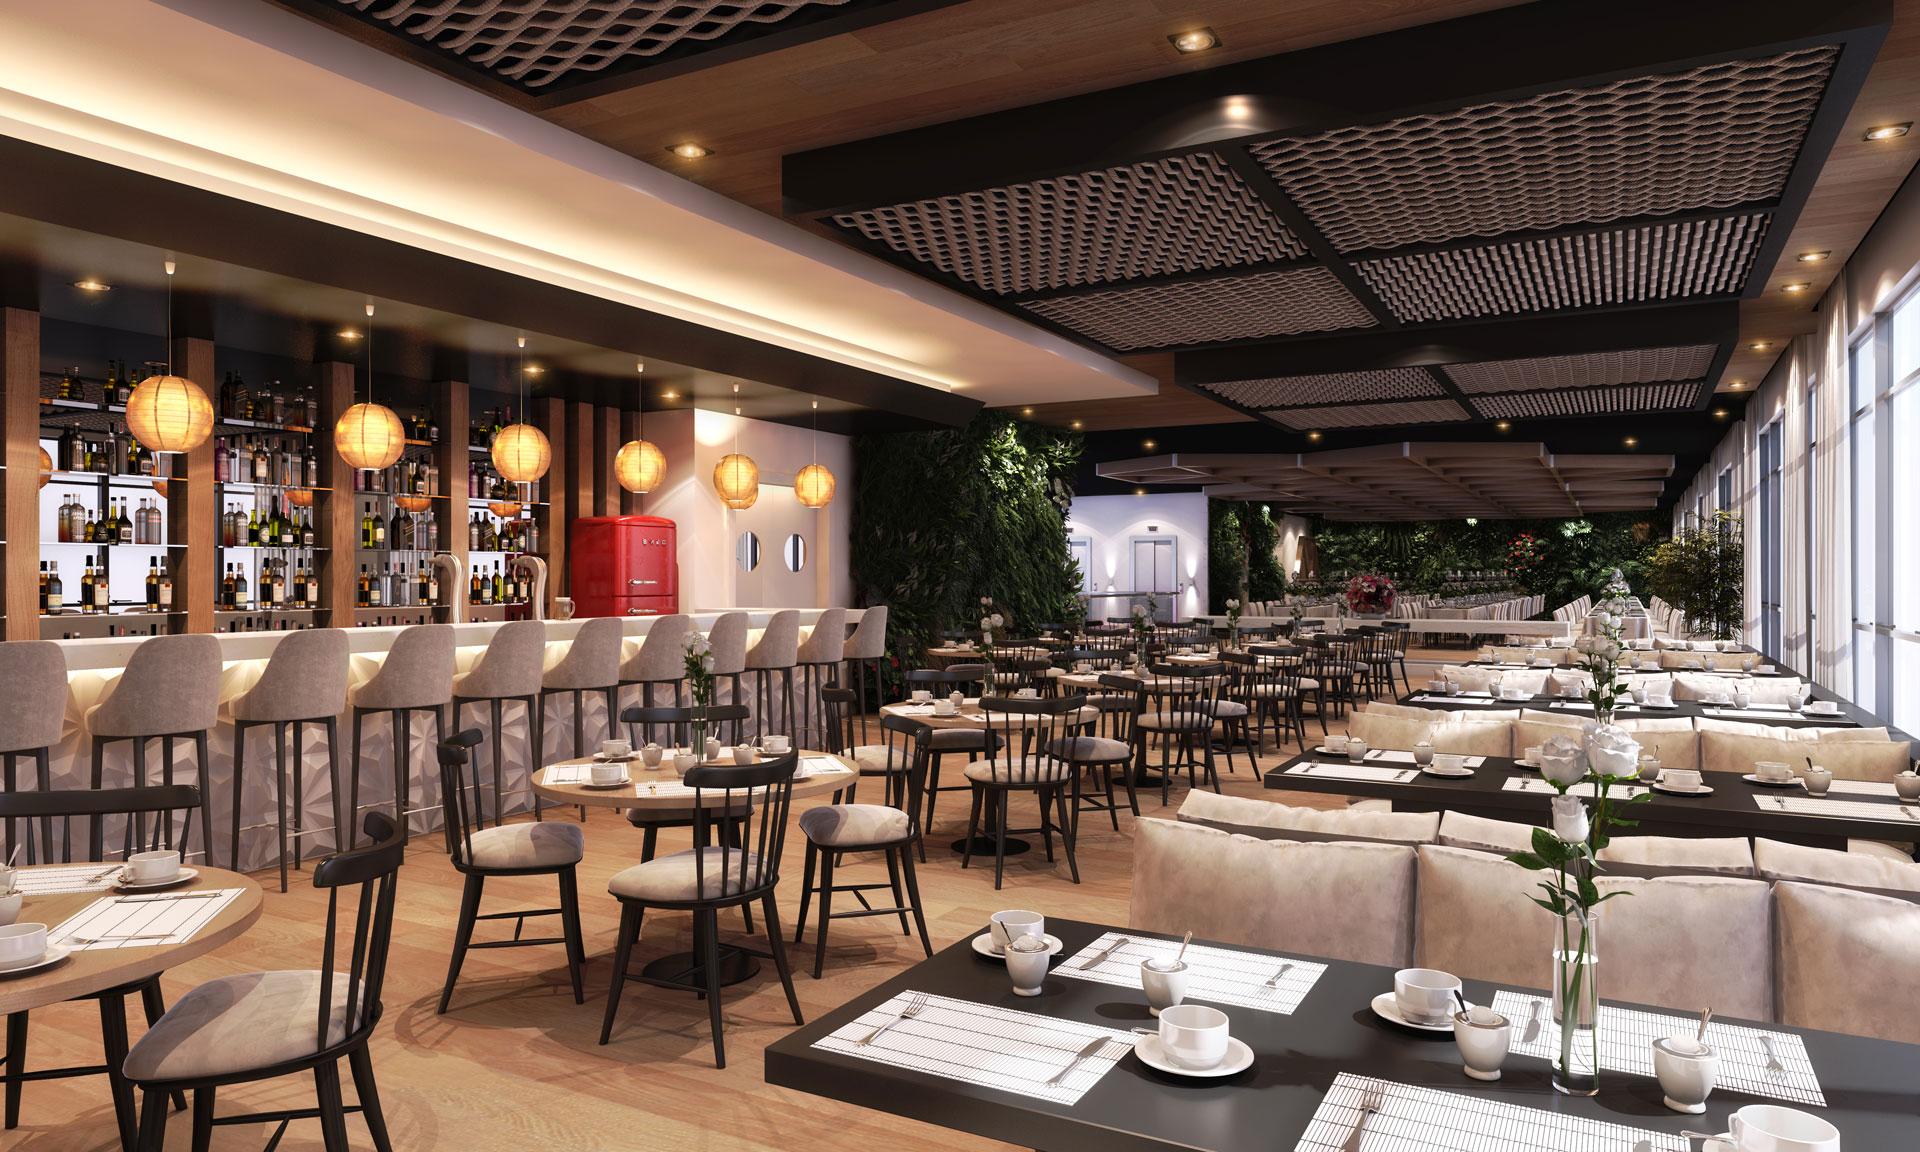 Restaurante-e-Bar---A---02